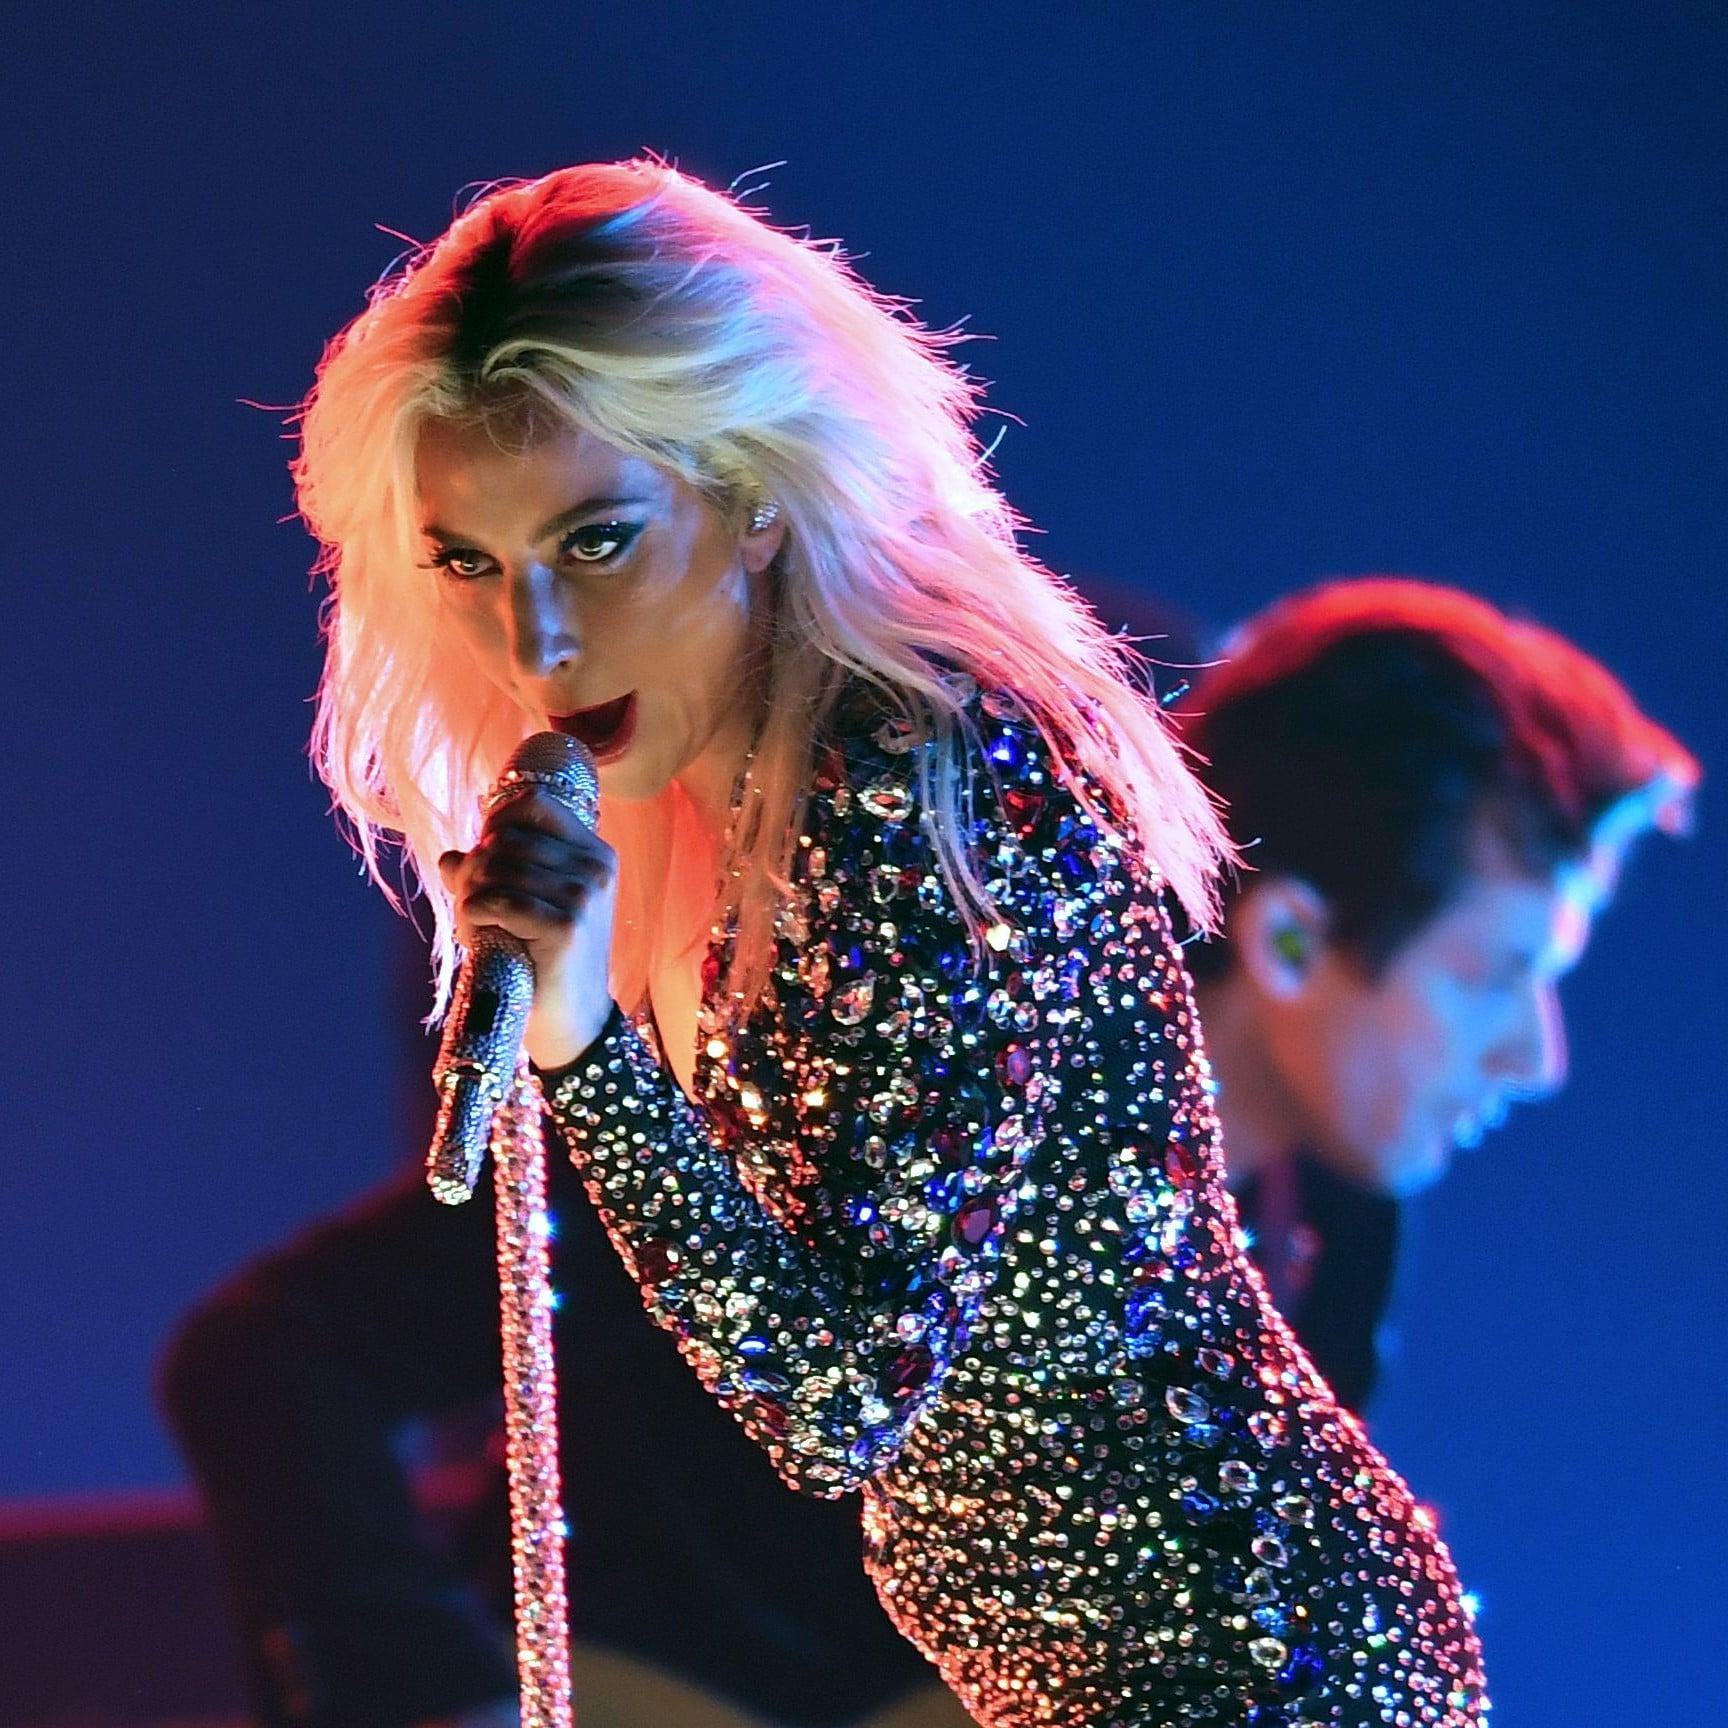 Lady Gaga stage performance